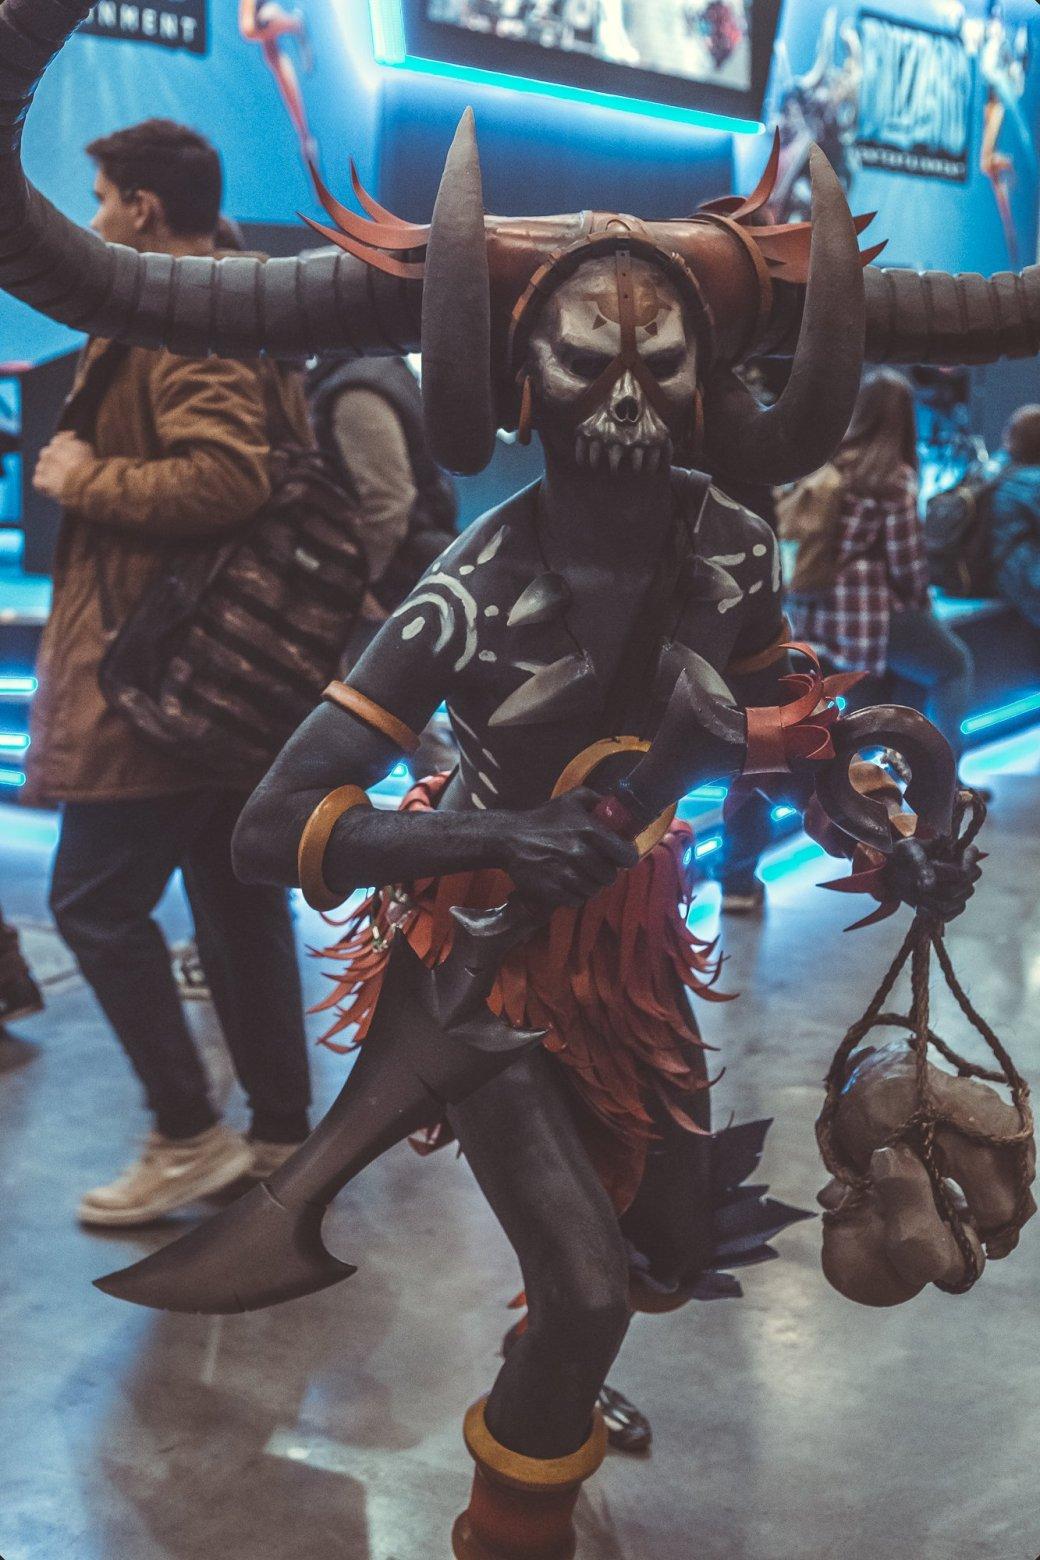 ФОТО. Косплей на«ИгроМире 2017» иComic Con Russia 2017. - Изображение 17